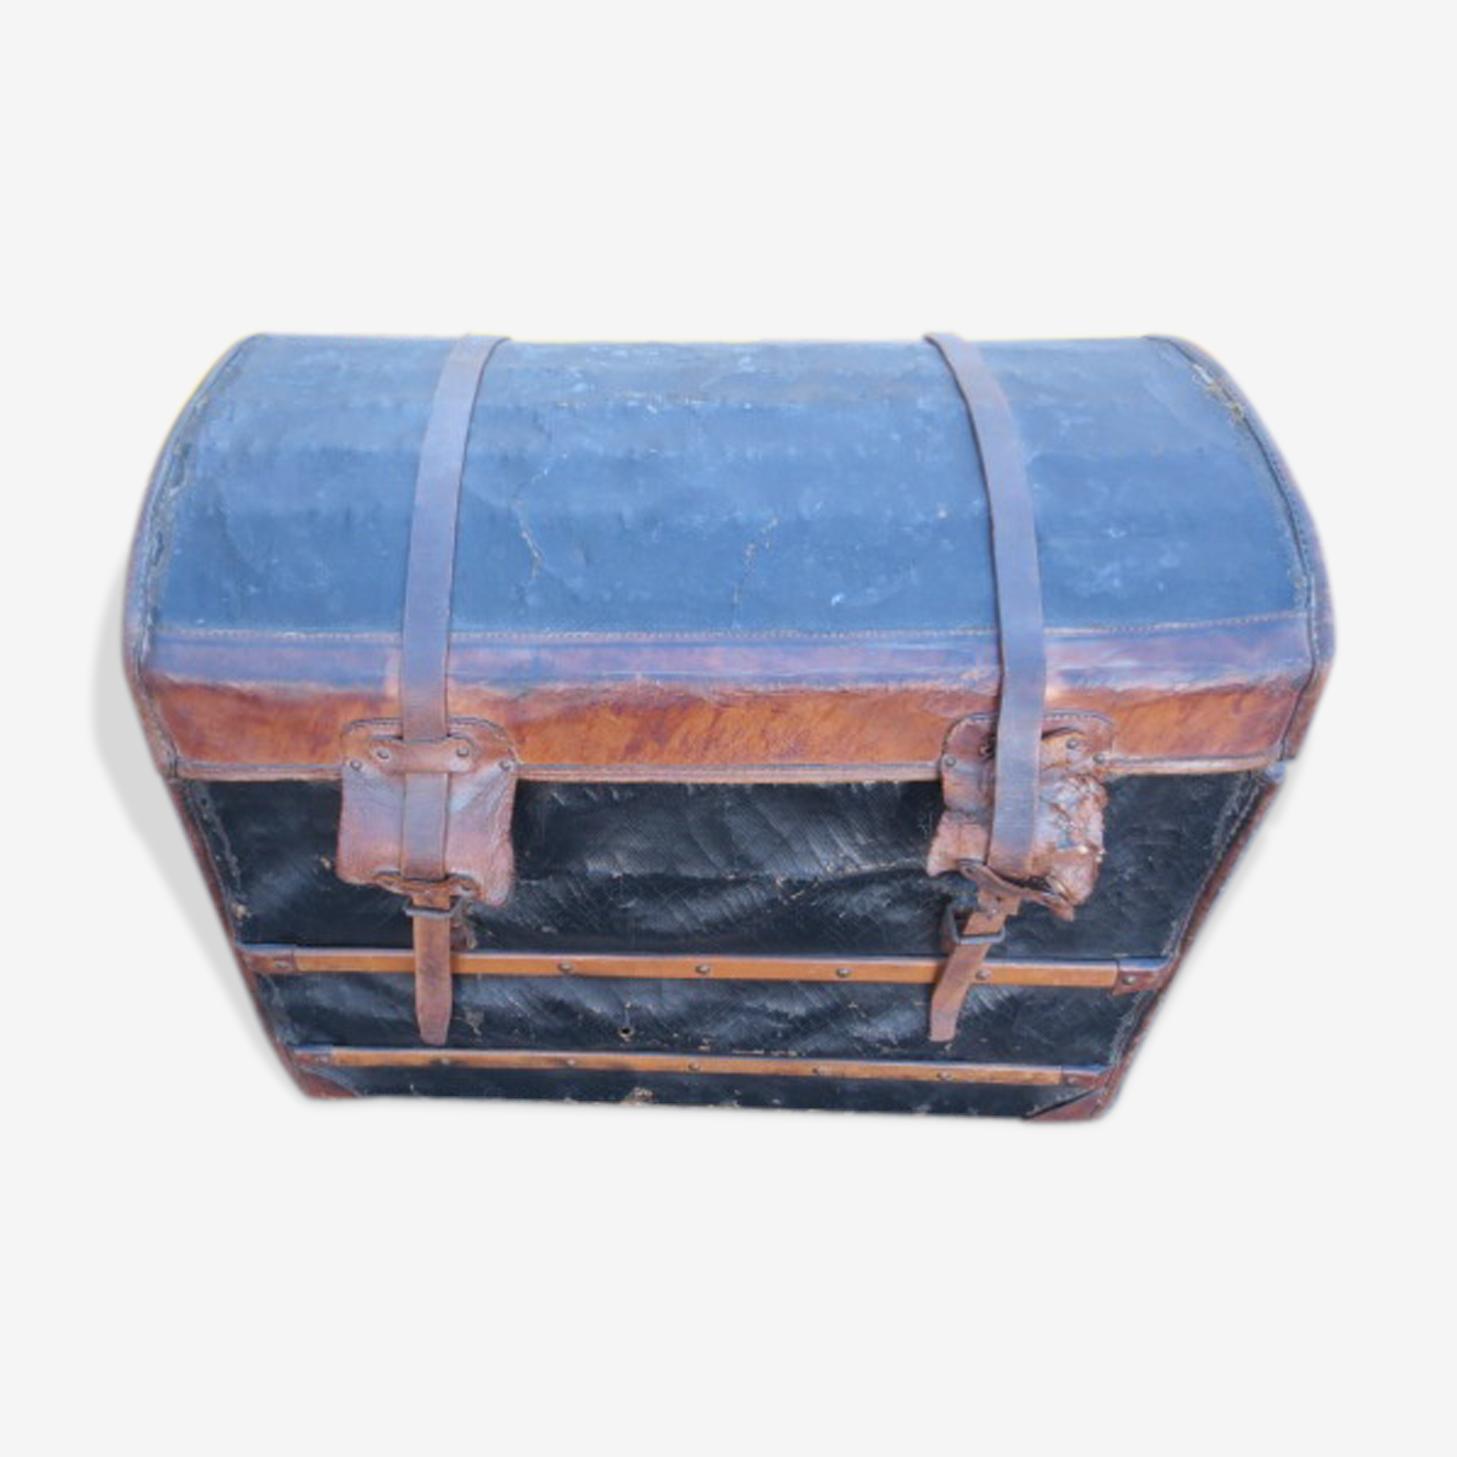 Ancienne malle en cuir